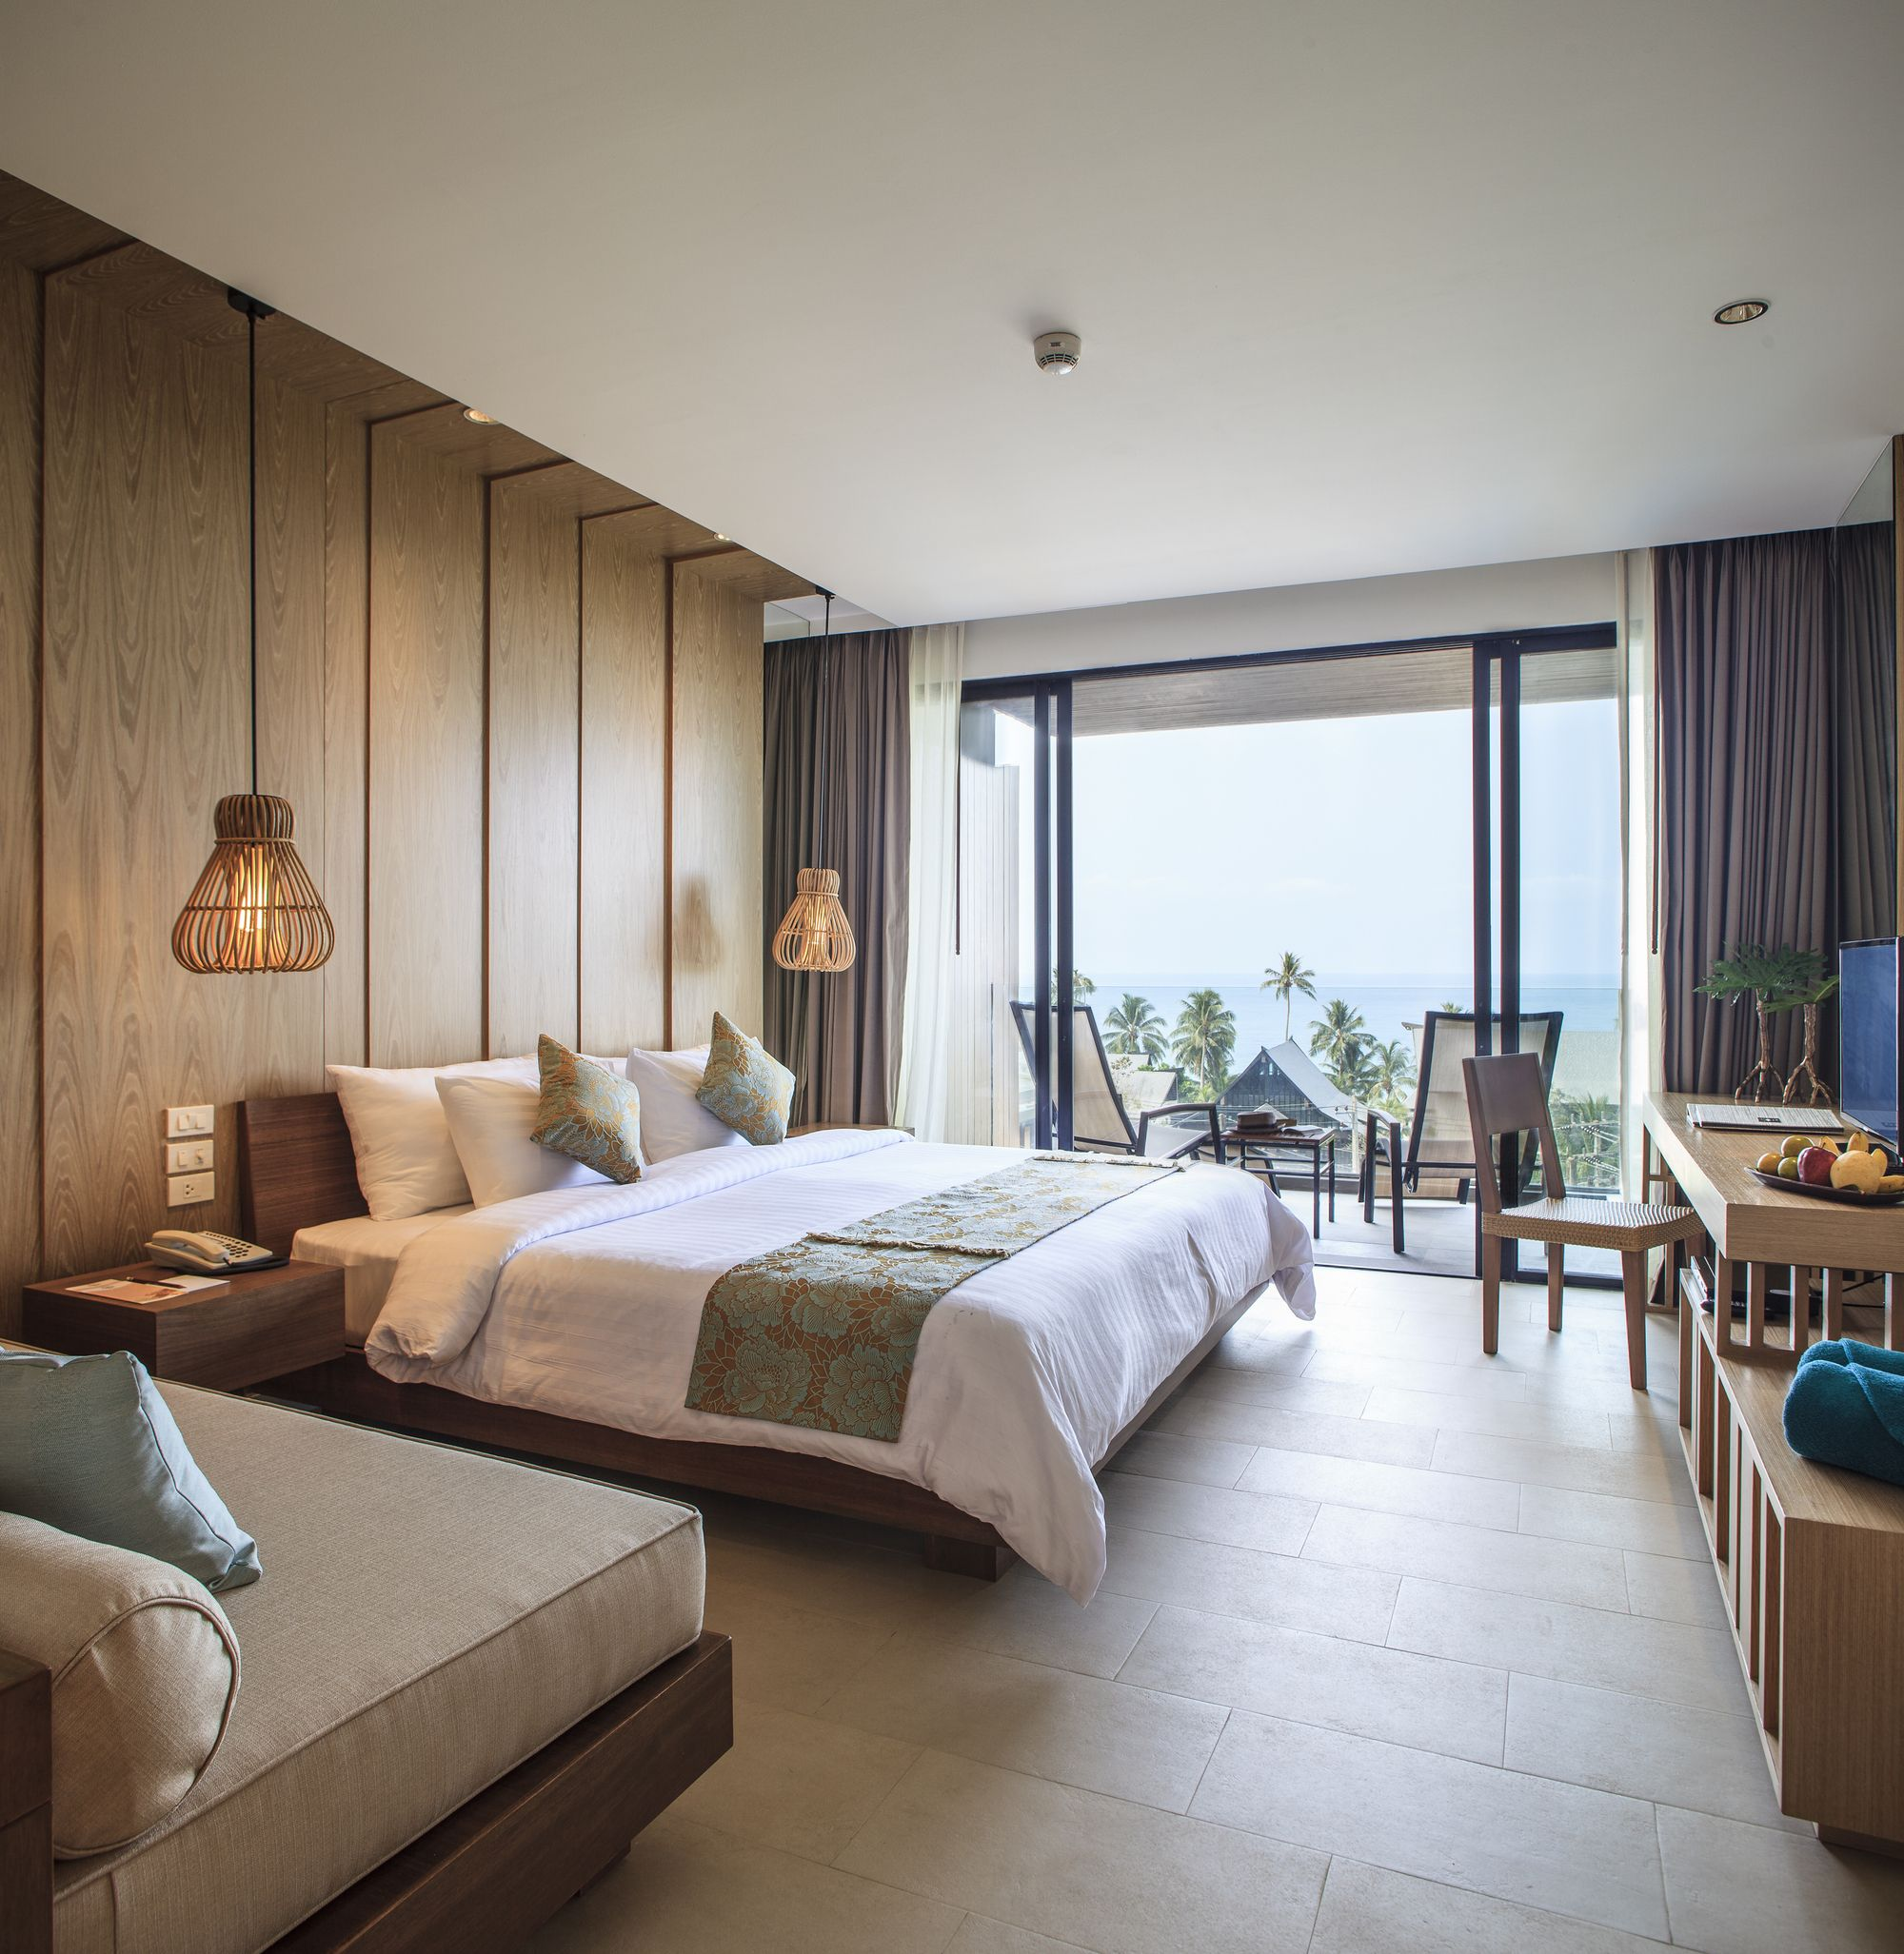 Photo Hotel Bedroom Modern Design